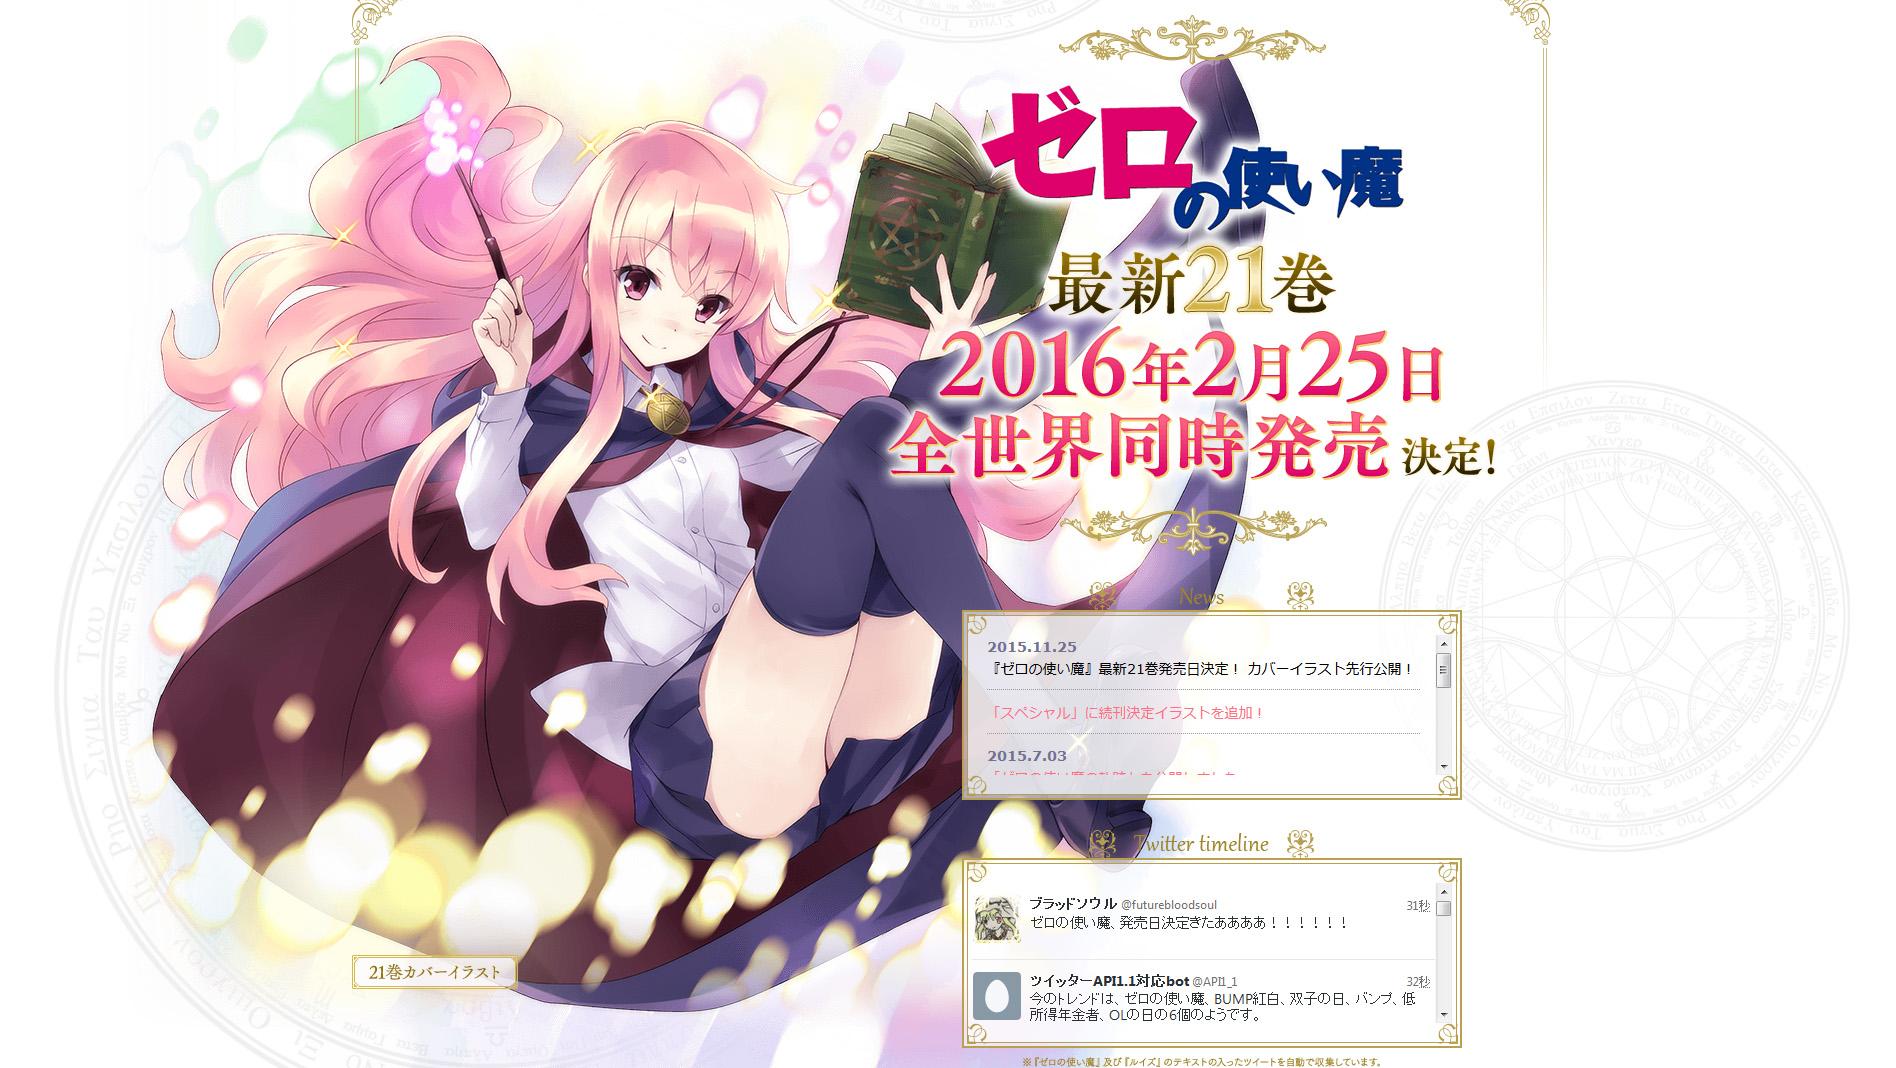 New Volume of Zero no Tsukaima Light Novel Series to Be Released in 2016